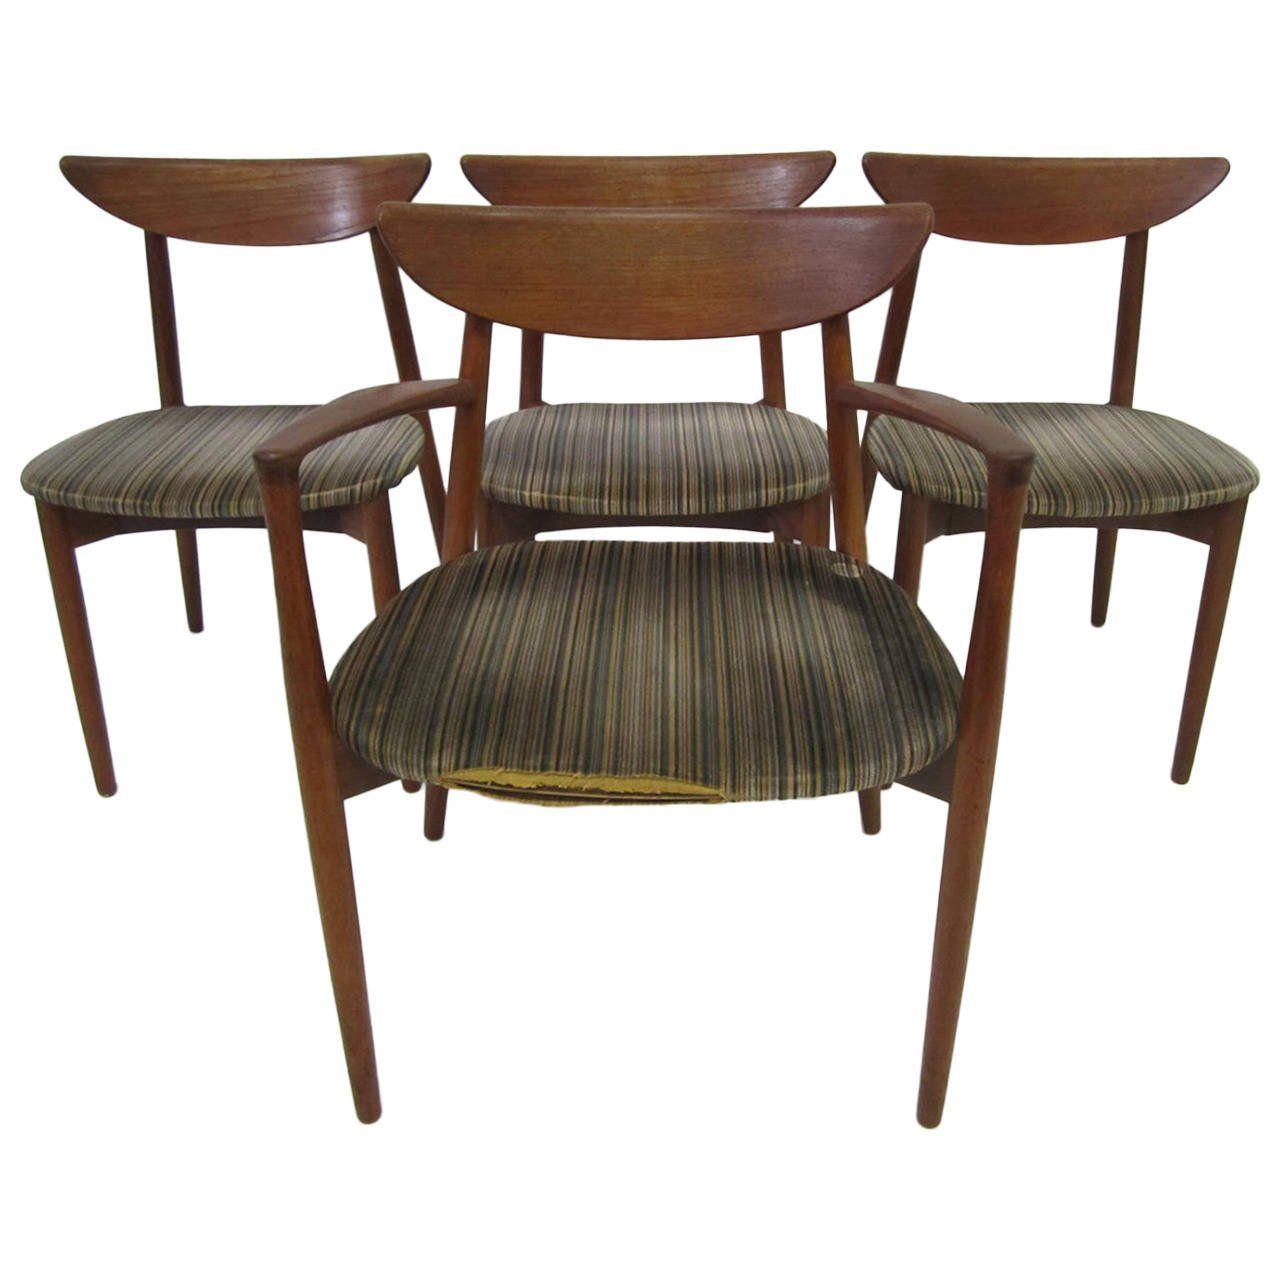 Harry Ostergaard mid century Danish modern Teak dining chairs - Harry Ostergaard Mid Century Danish Modern Teak Dining Chairs